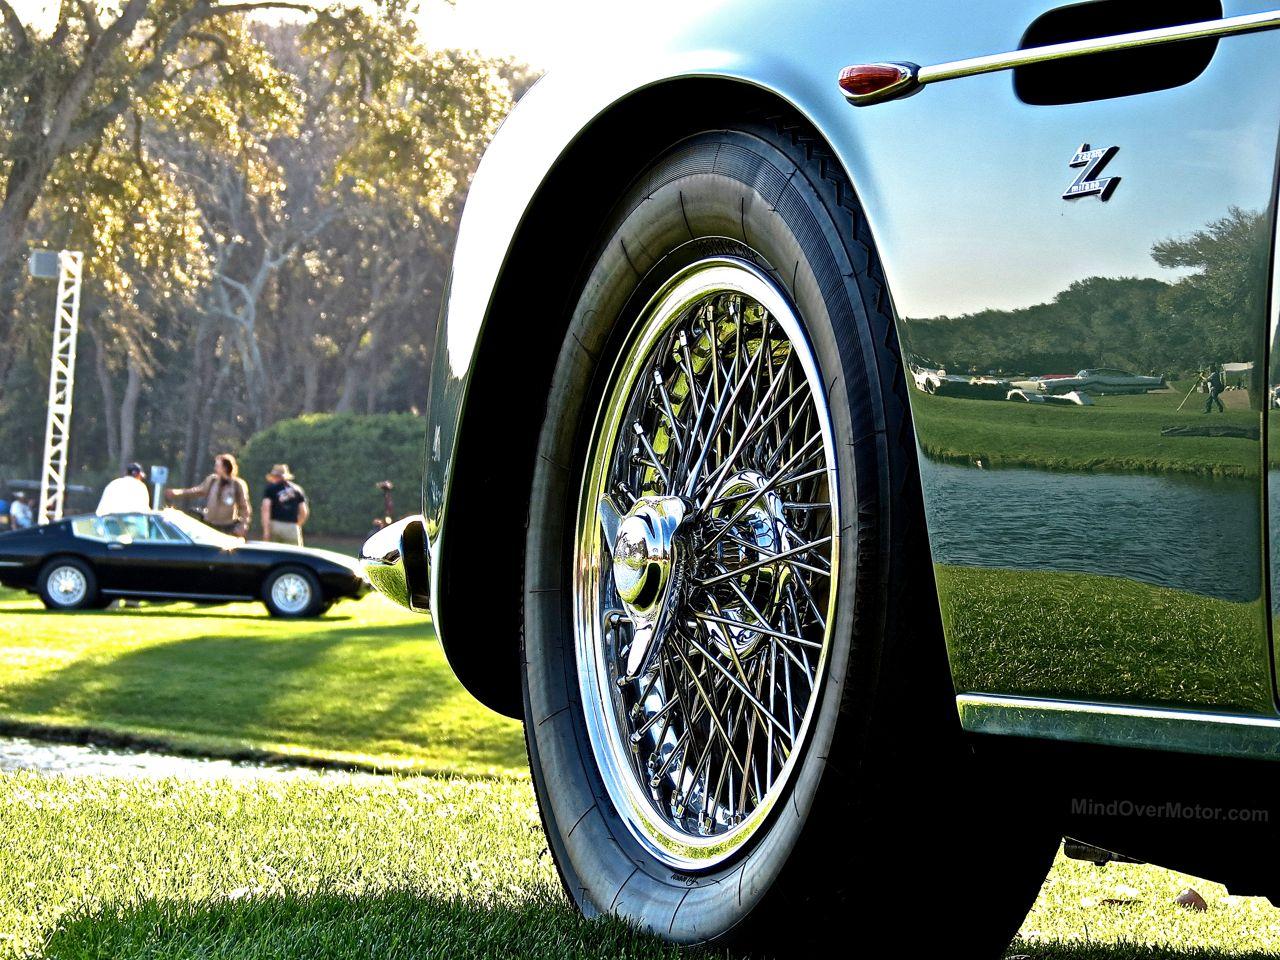 Aston Martin DB4 GT Zagato Amelia Island 10